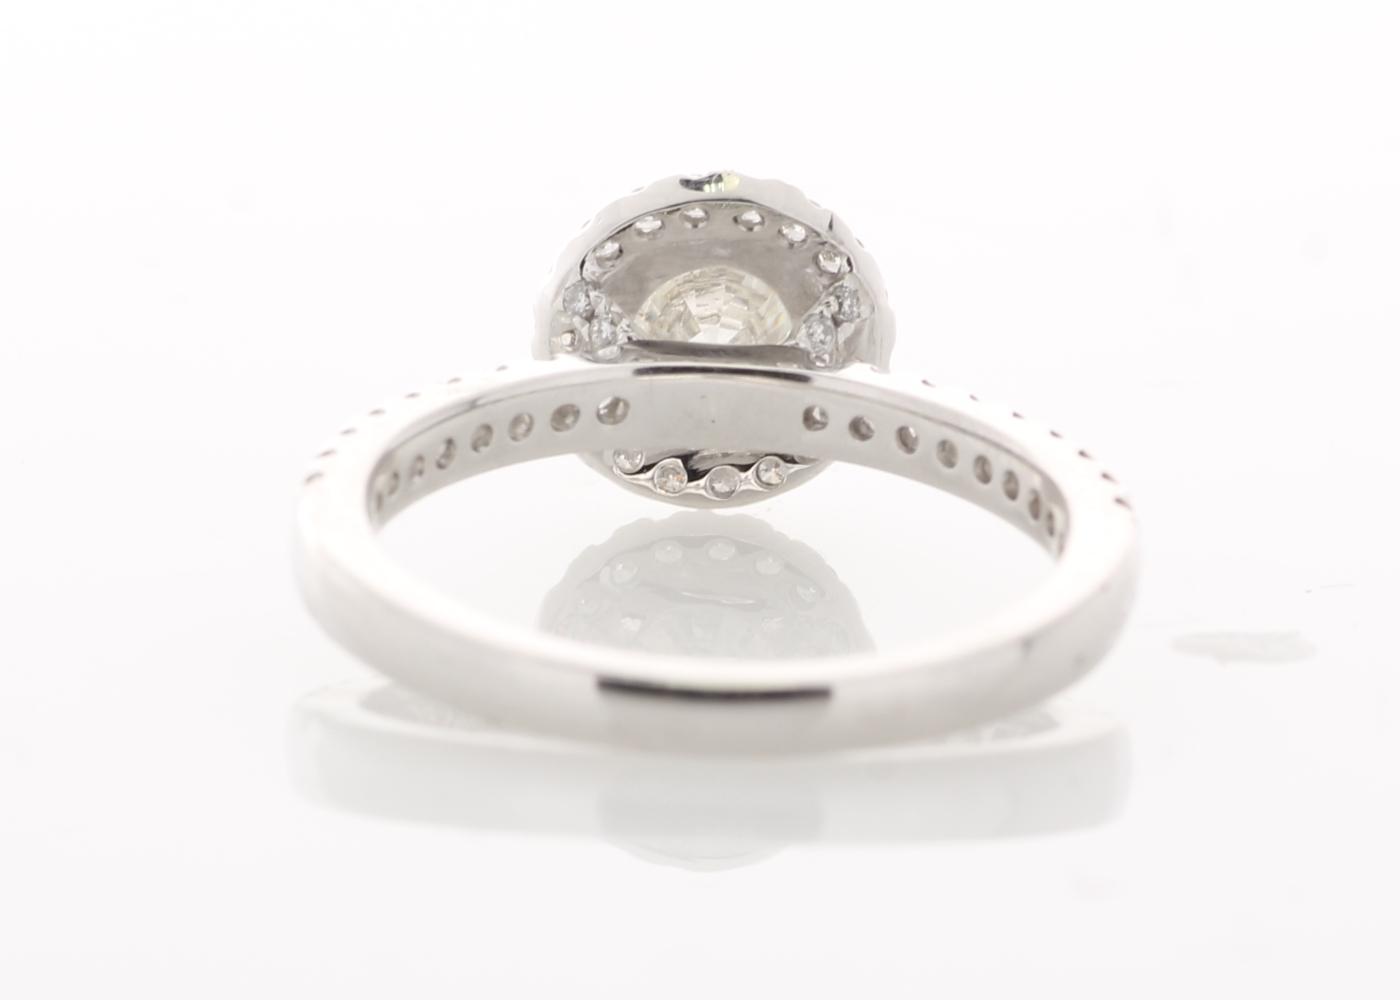 Lot 27 - 18ct White Gold Halo Set Ring 1.37 Carats